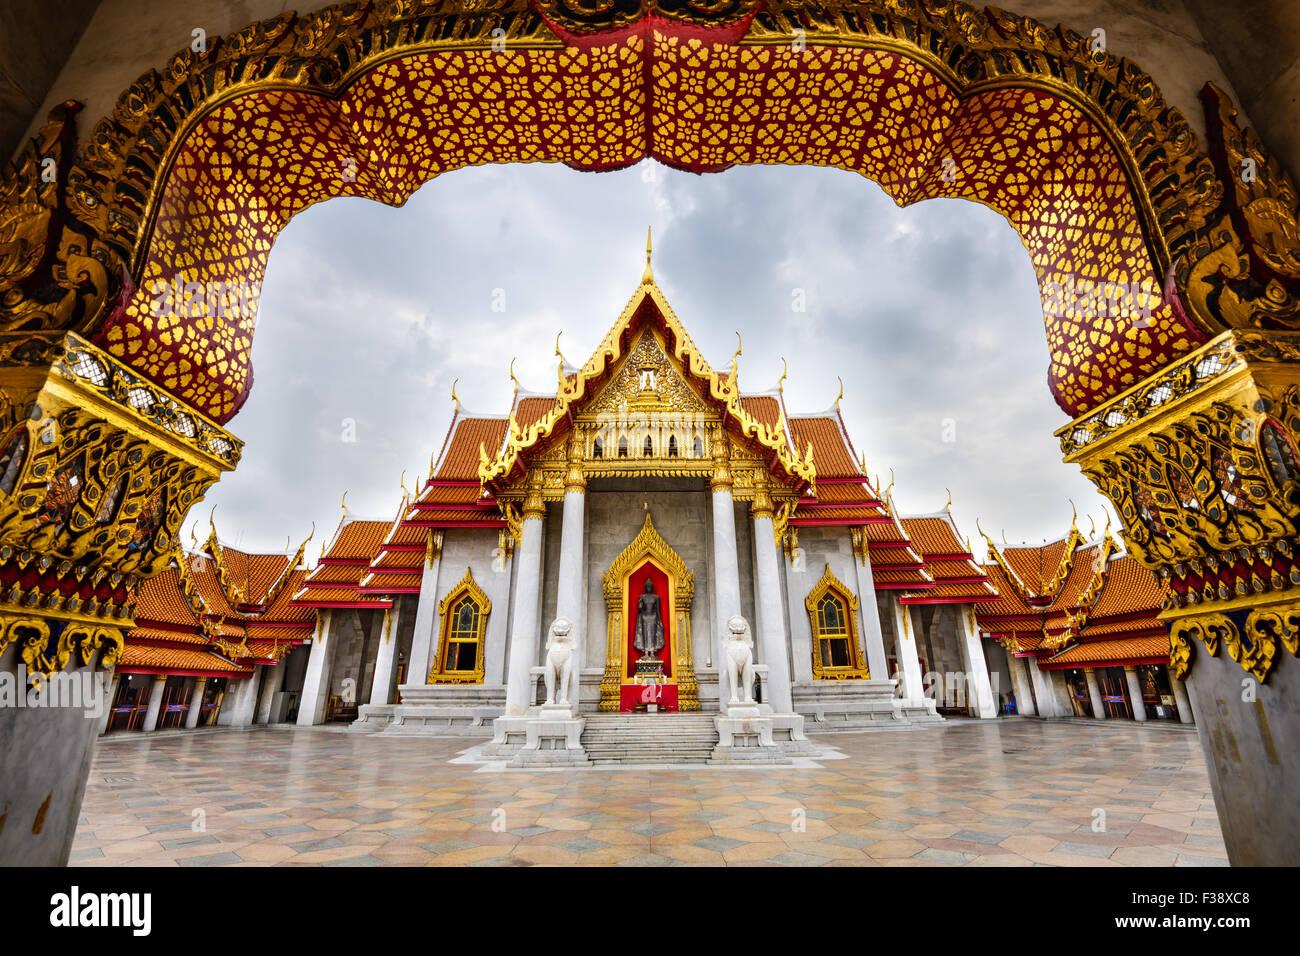 Wat Benchamabophit, the Marble Temple, in Bangkok, Thailand. - Stock Image